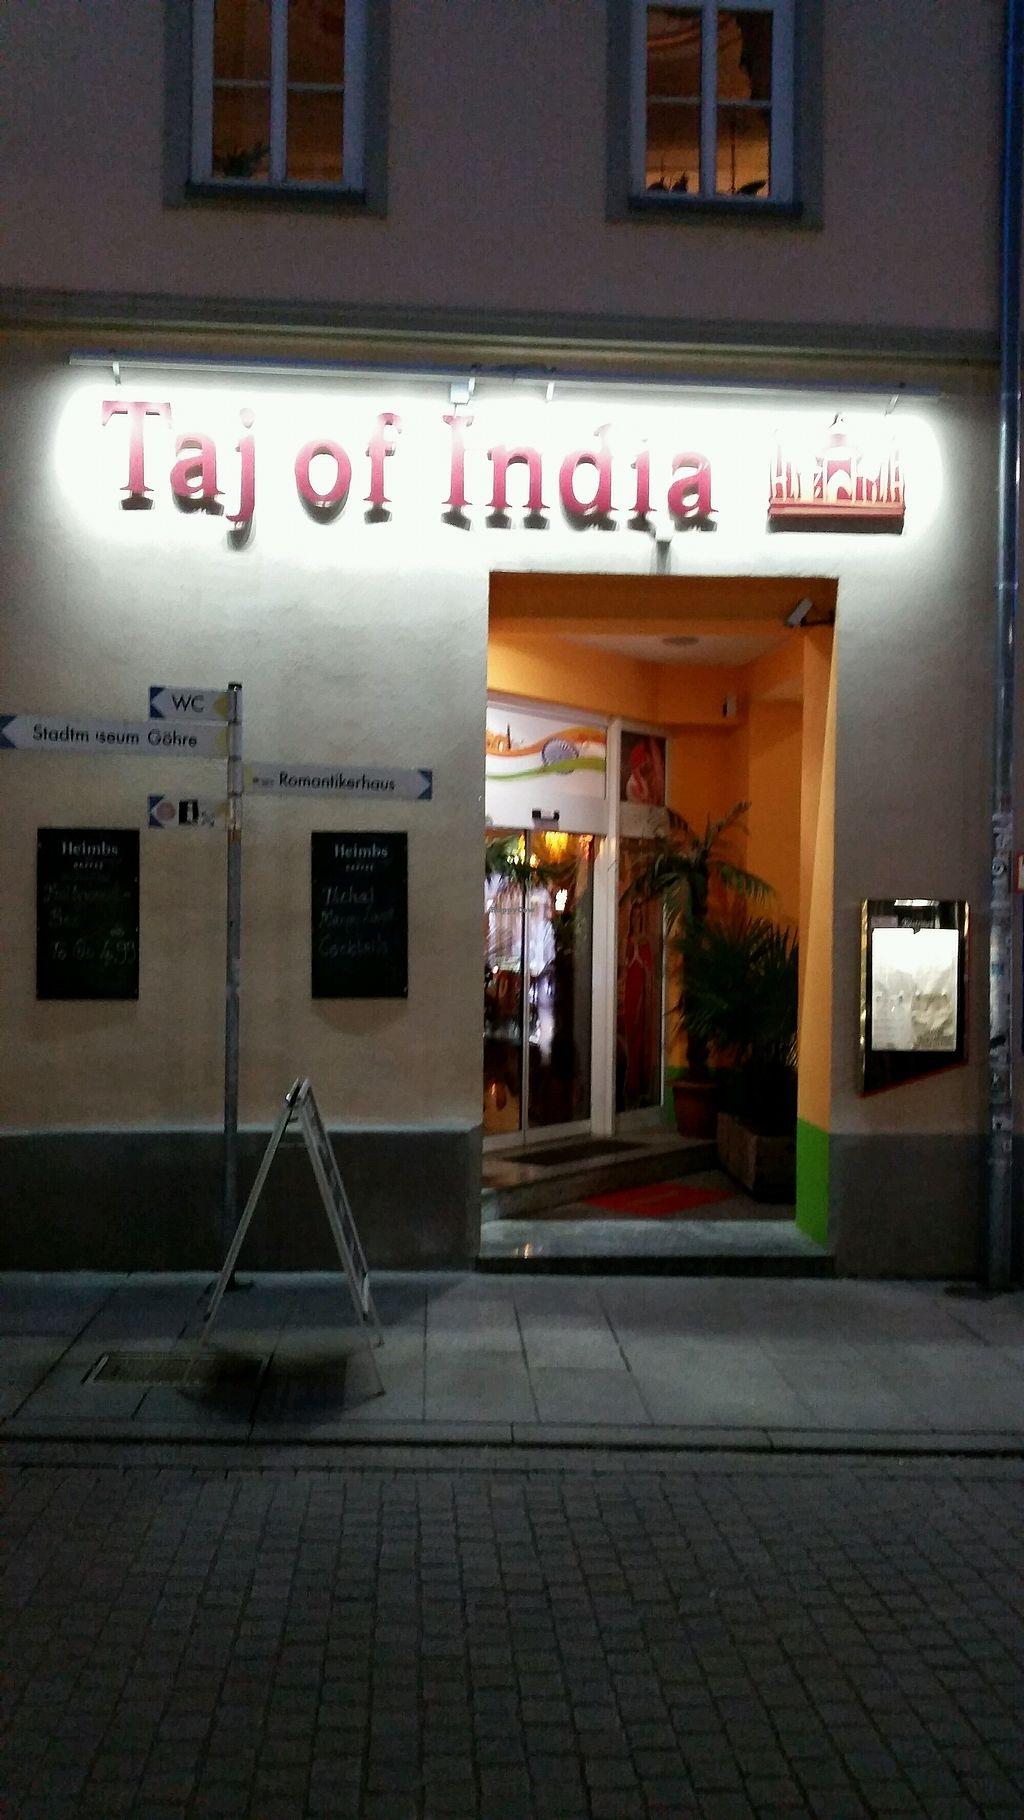 "Photo of Taj of India  by <a href=""/members/profile/DiscoStu"">DiscoStu</a> <br/>Entrance  <br/> February 13, 2018  - <a href='/contact/abuse/image/110164/358875'>Report</a>"